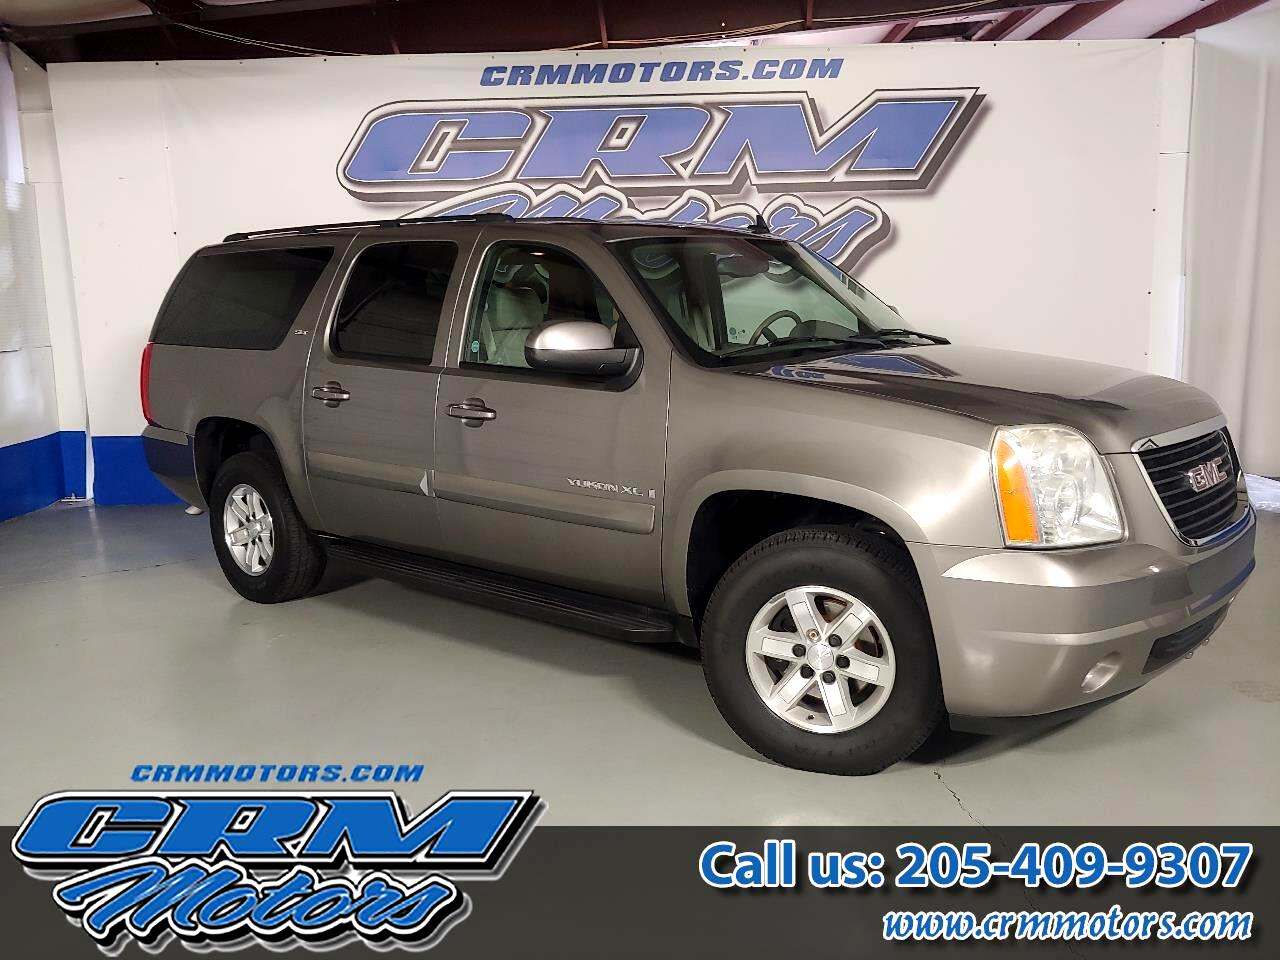 2008 GMC Yukon XL 2WD SLT, LEATHER, CAPT CHAIRS, & MORE!